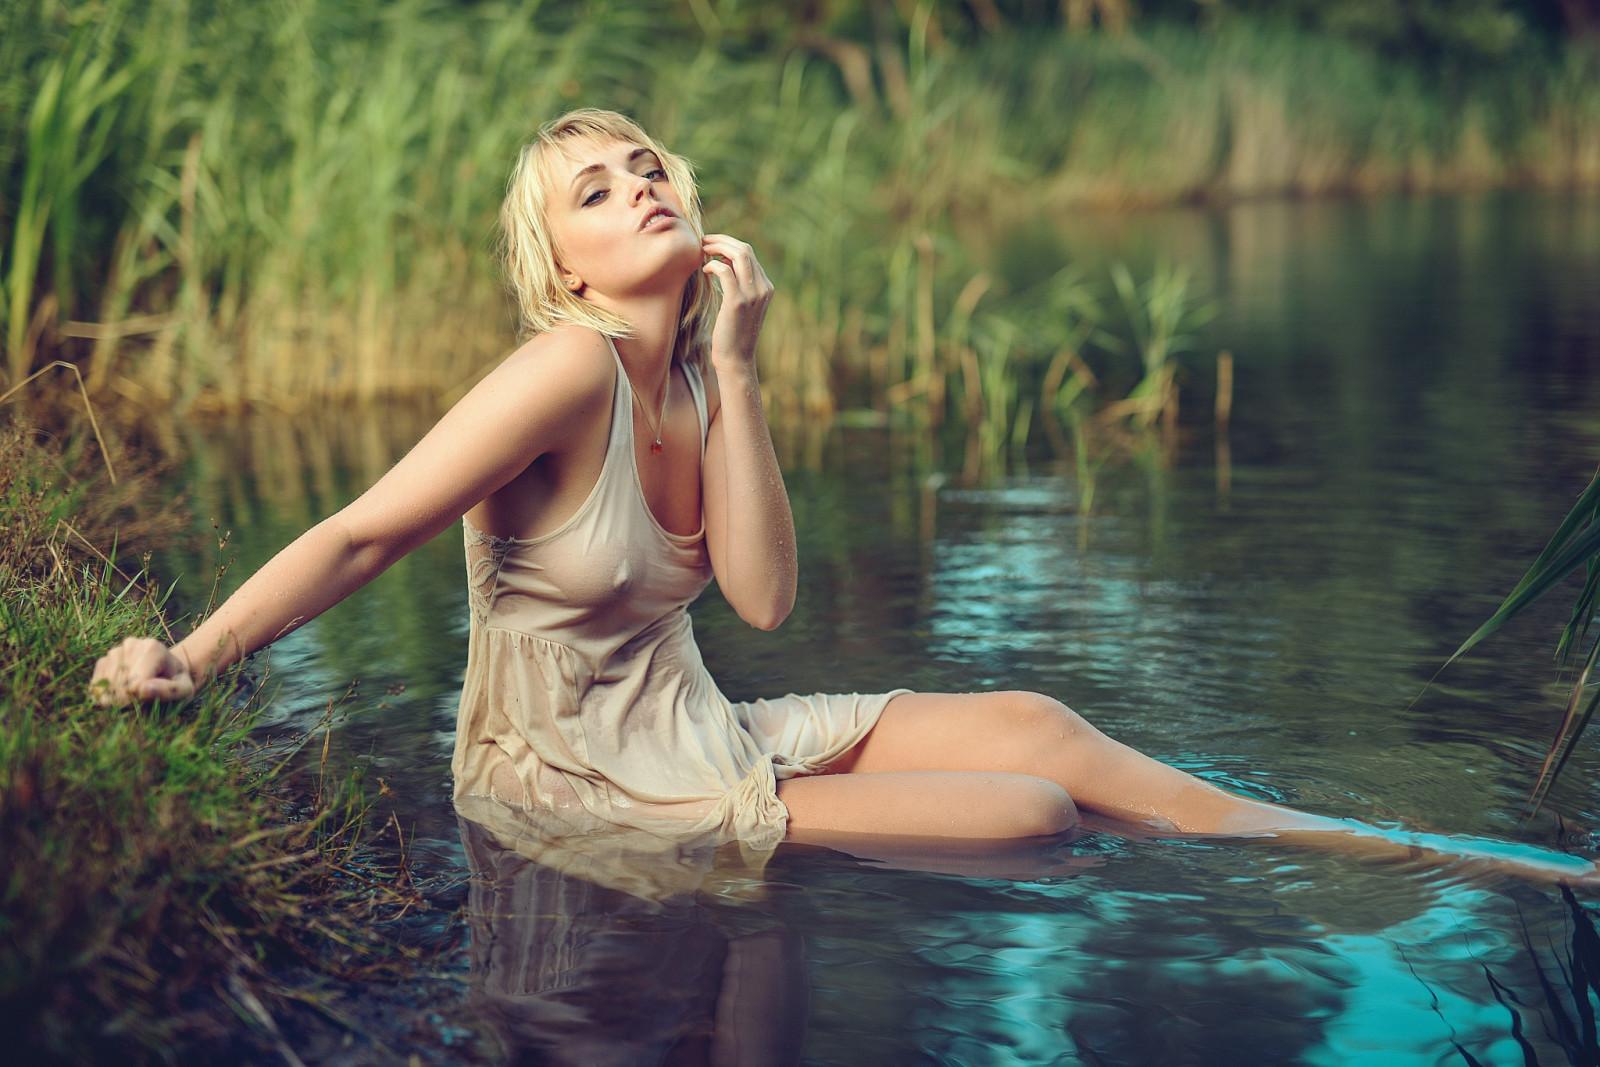 Dj Girl Wallpaper Hd Wallpaper Sunlight Women Blonde Lake Nature Short